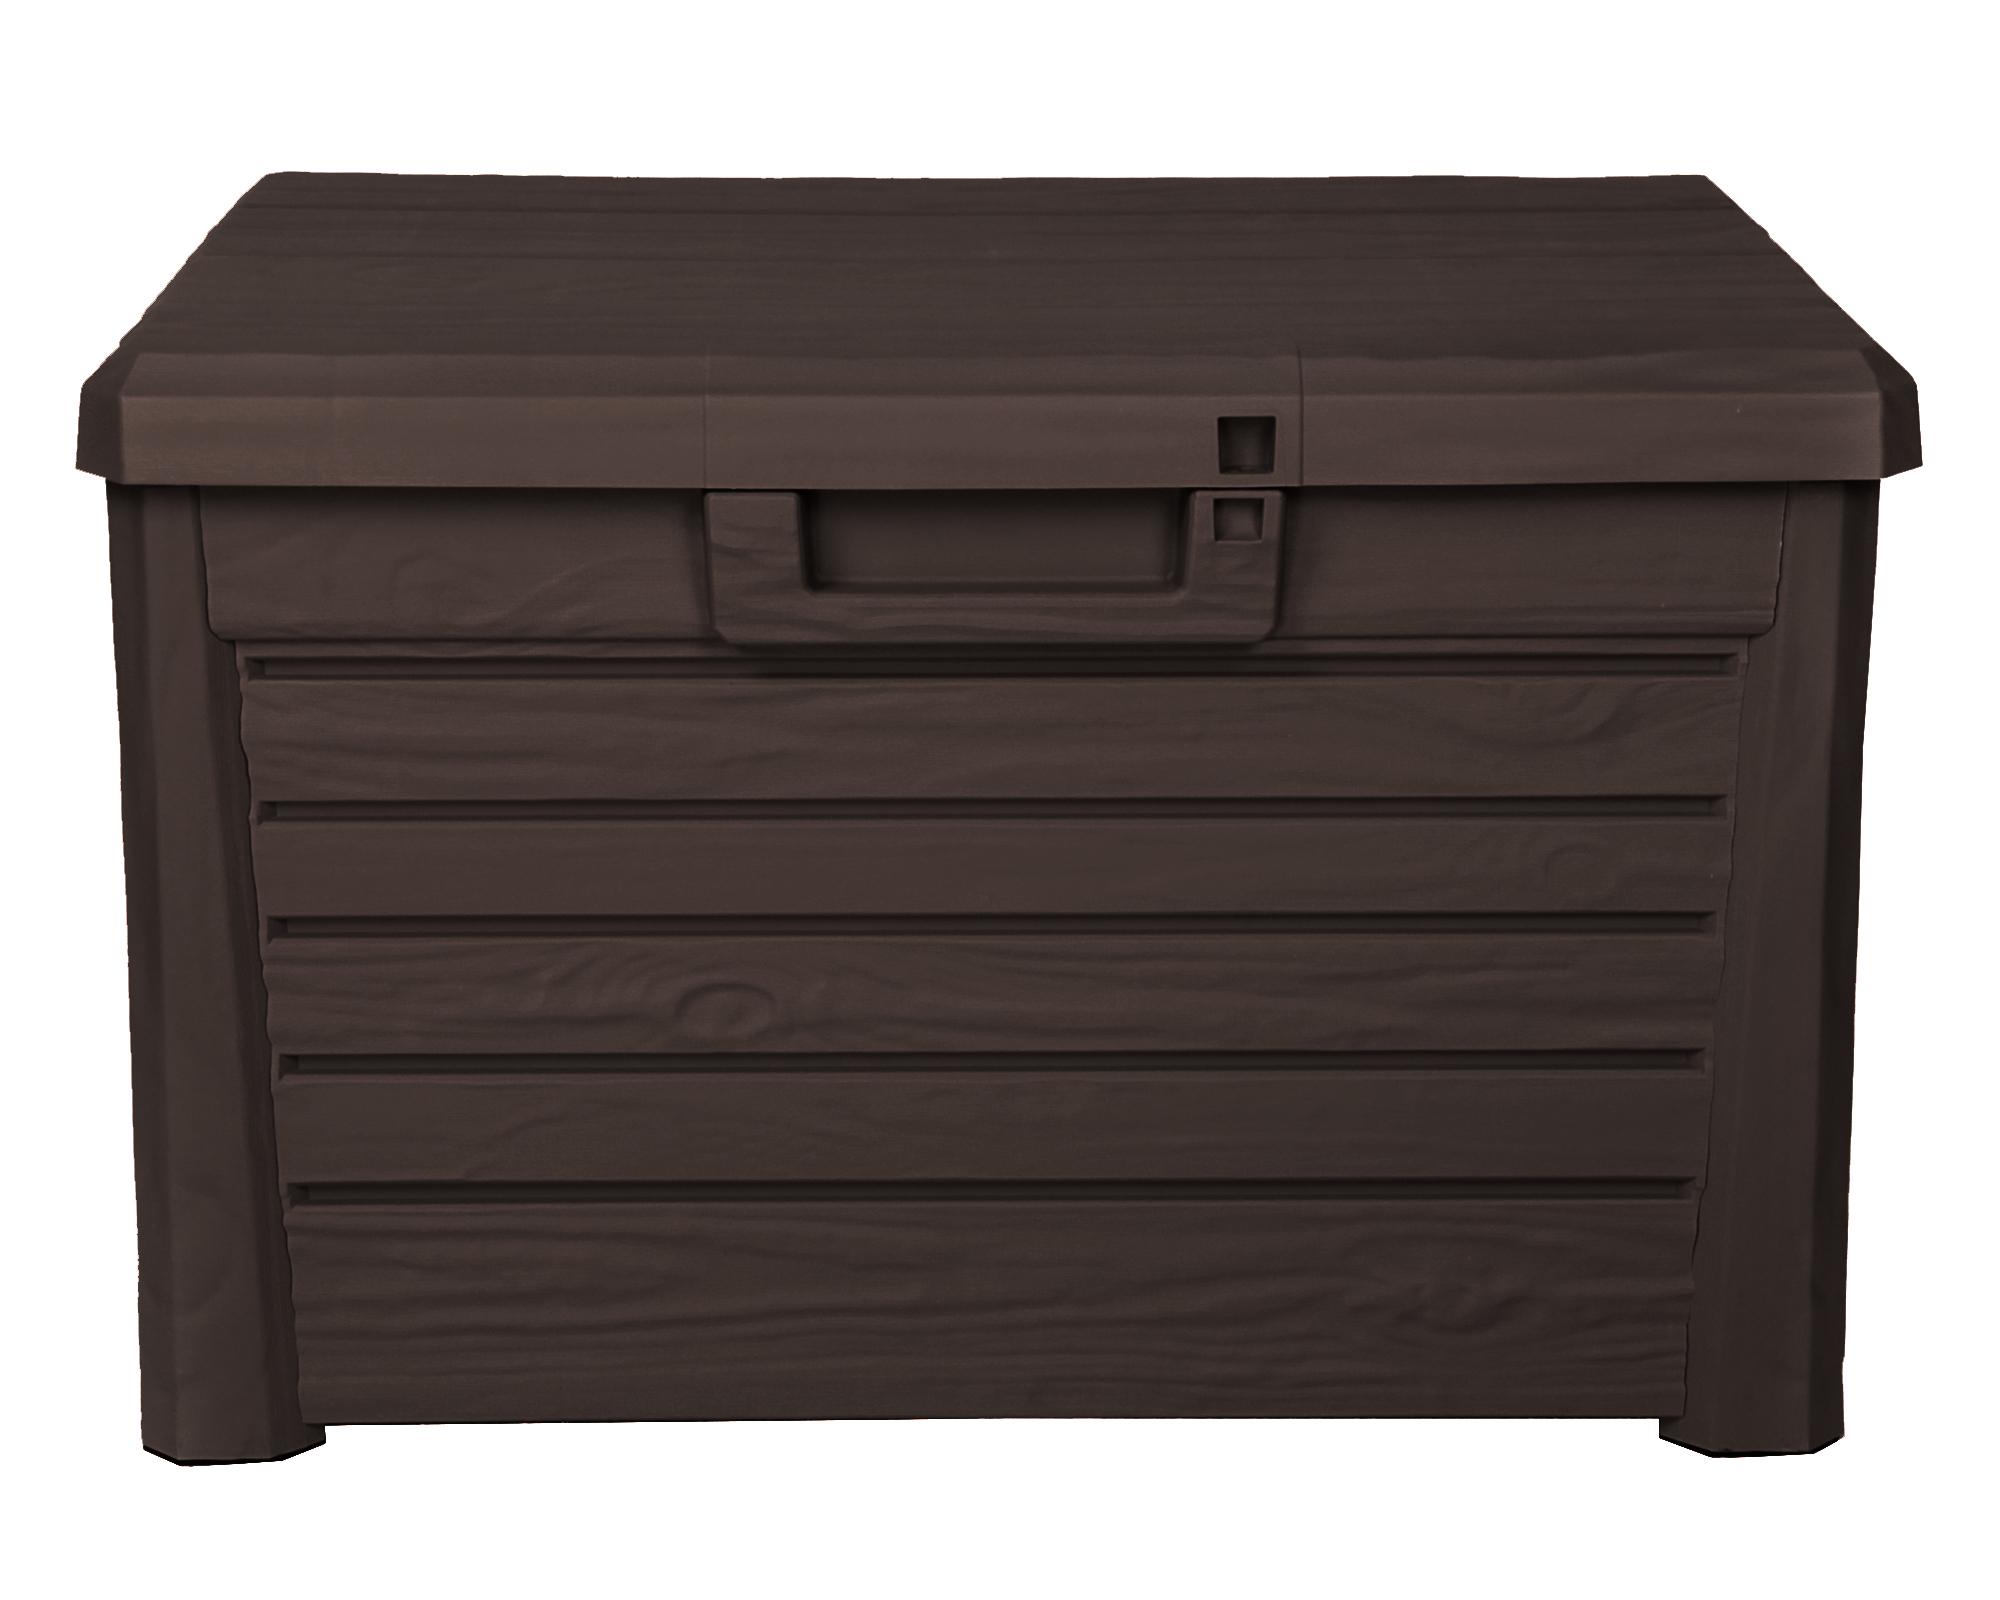 ondis24 kissenbox sitztruhe florida kompakt 120 l braun g nstig online kaufen. Black Bedroom Furniture Sets. Home Design Ideas